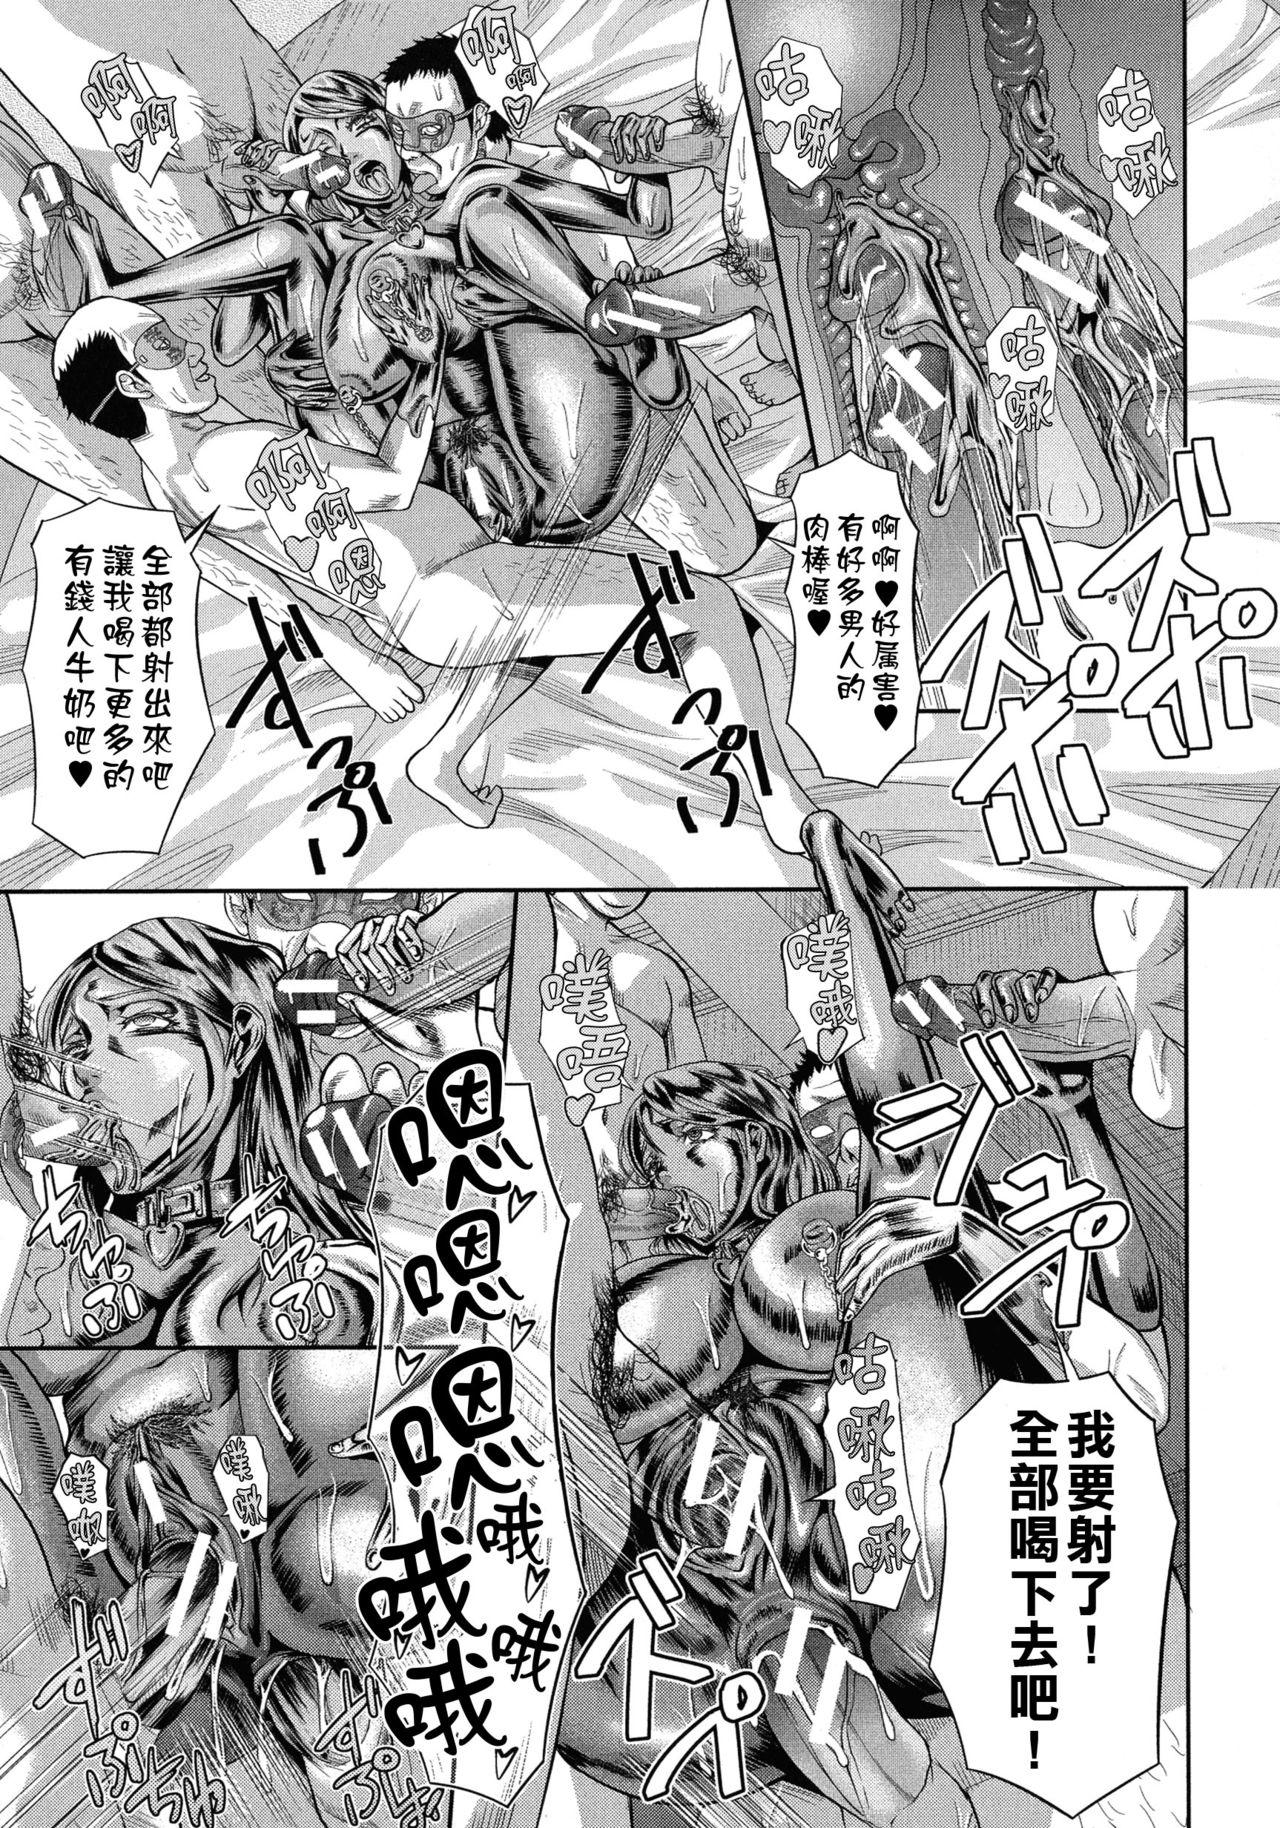 [Honebuto Danshaku] Innou Kaizou Program ~Oyako Zecchou Cult Ochi~ [Chinese]【不想记名重嵌--高质量图源】 133